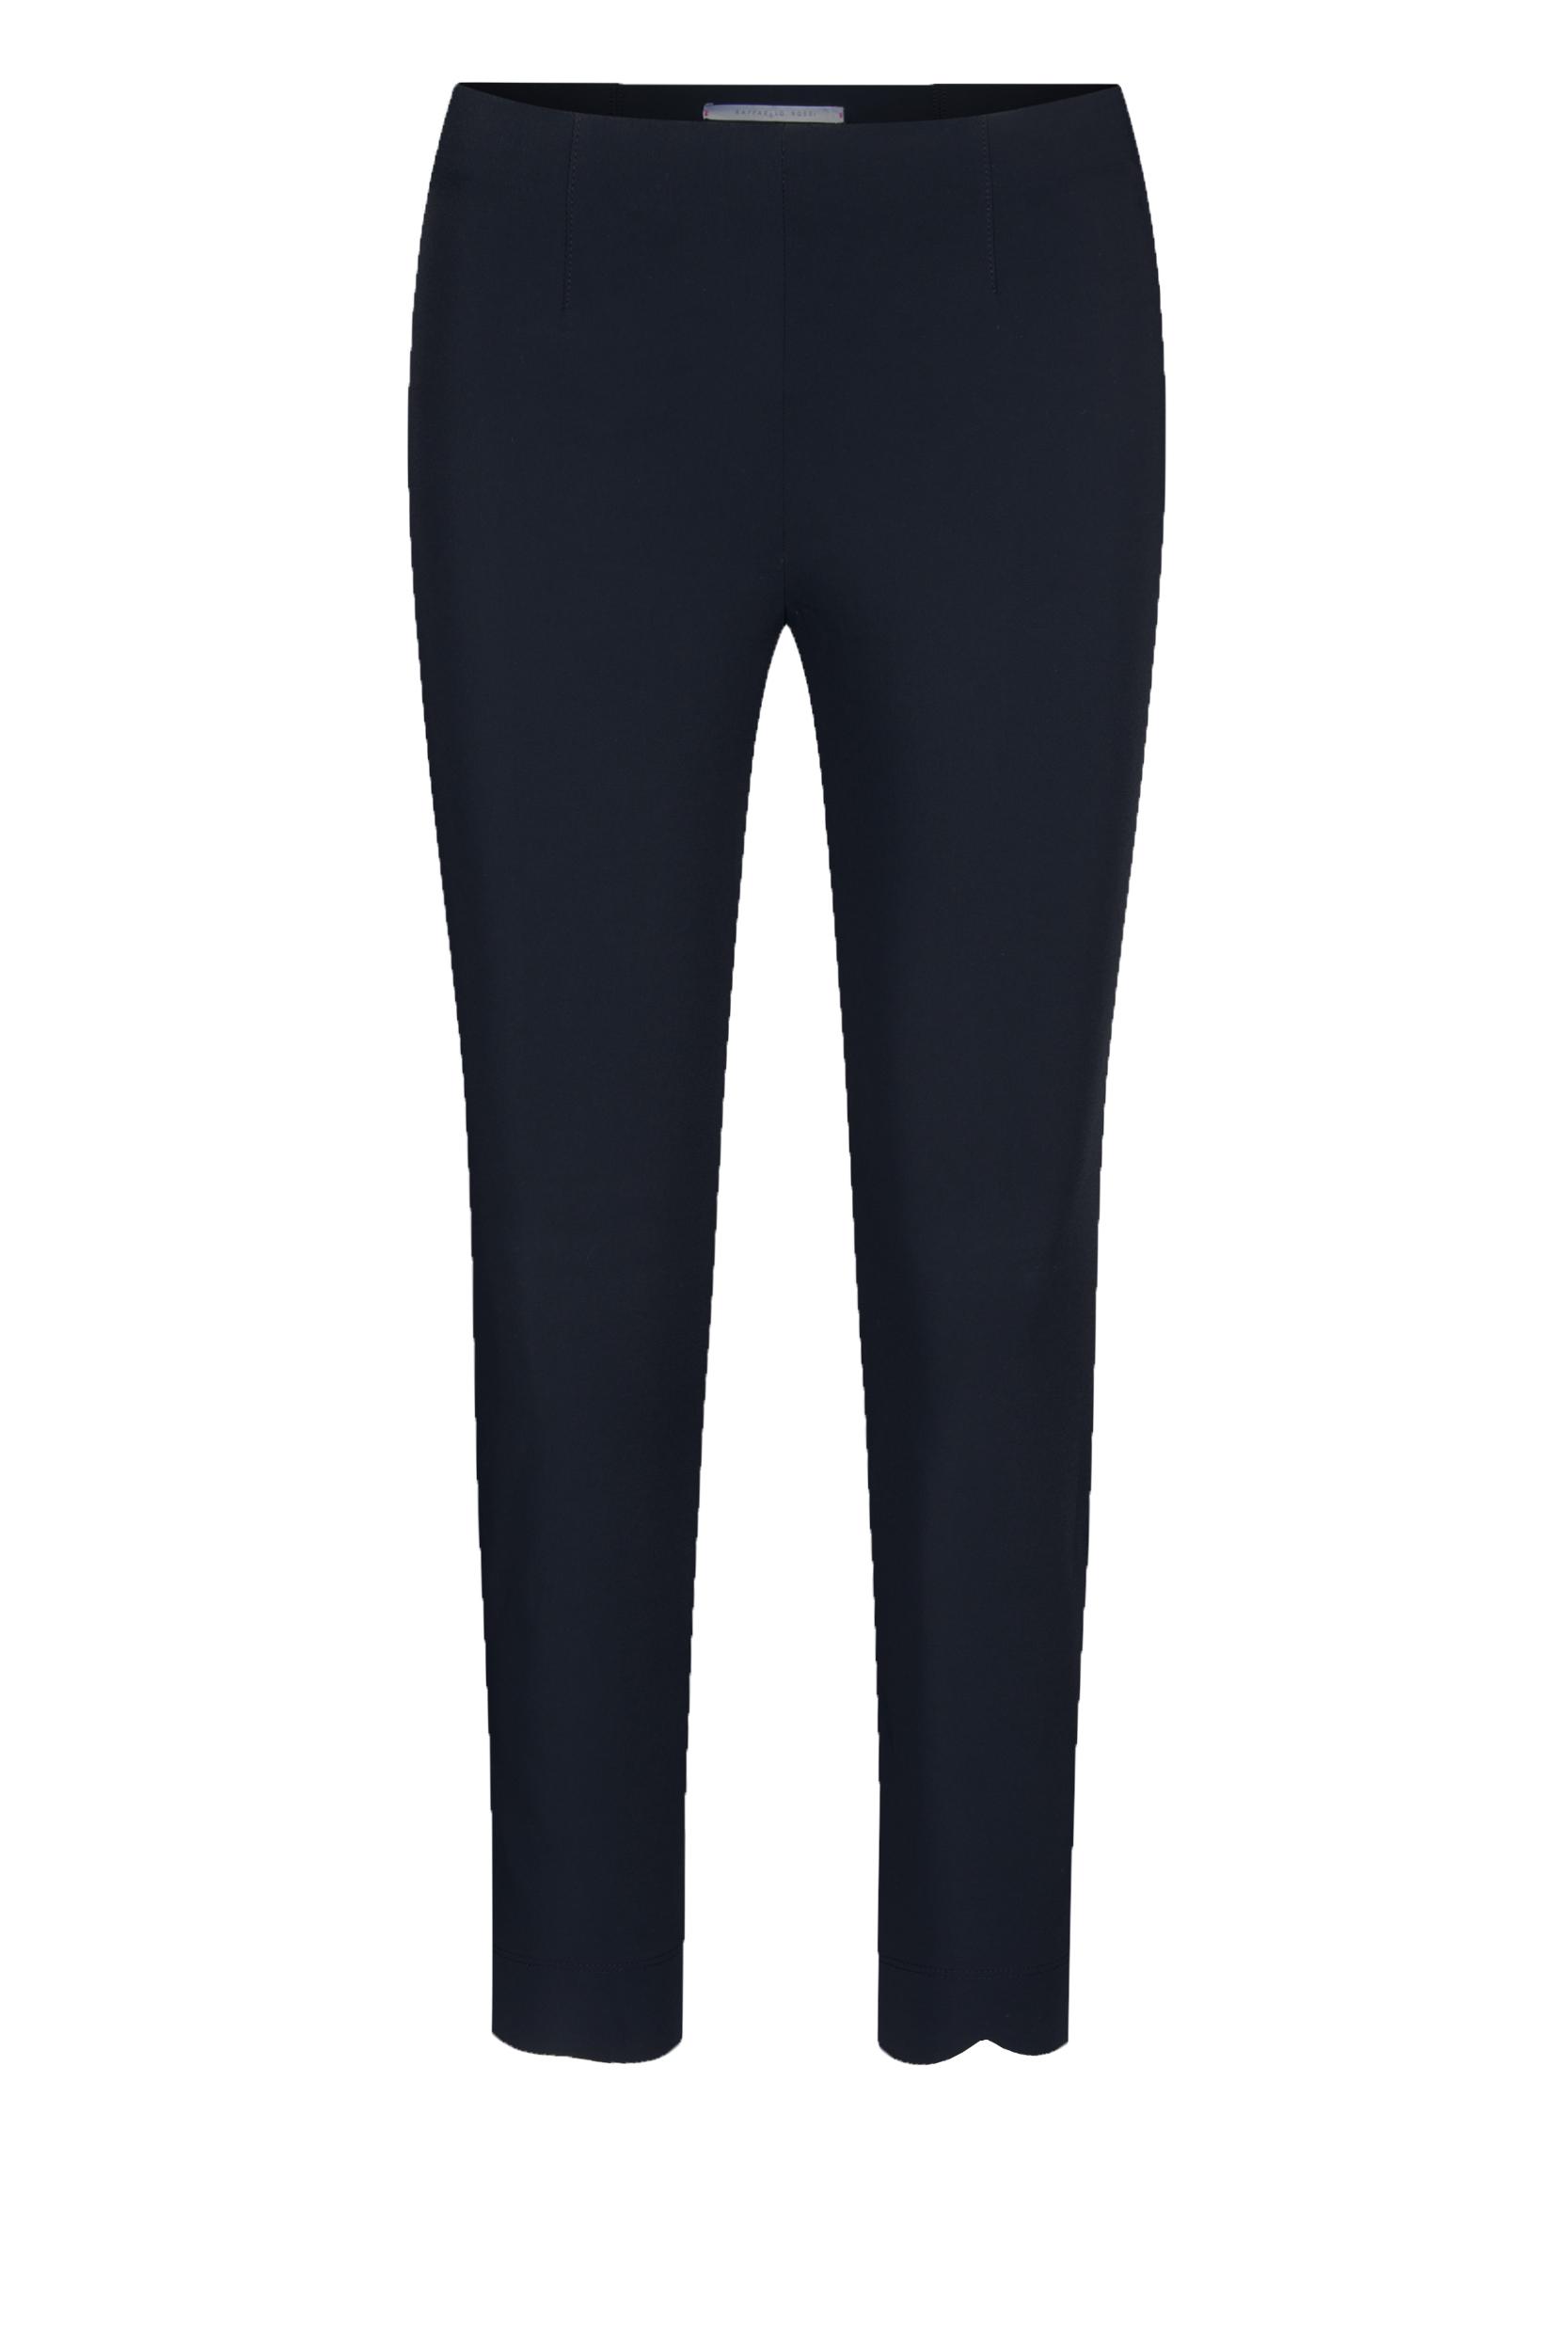 Raffaello Rossi Damen Hose Penny 6/8 Länge 40 dunkelblau